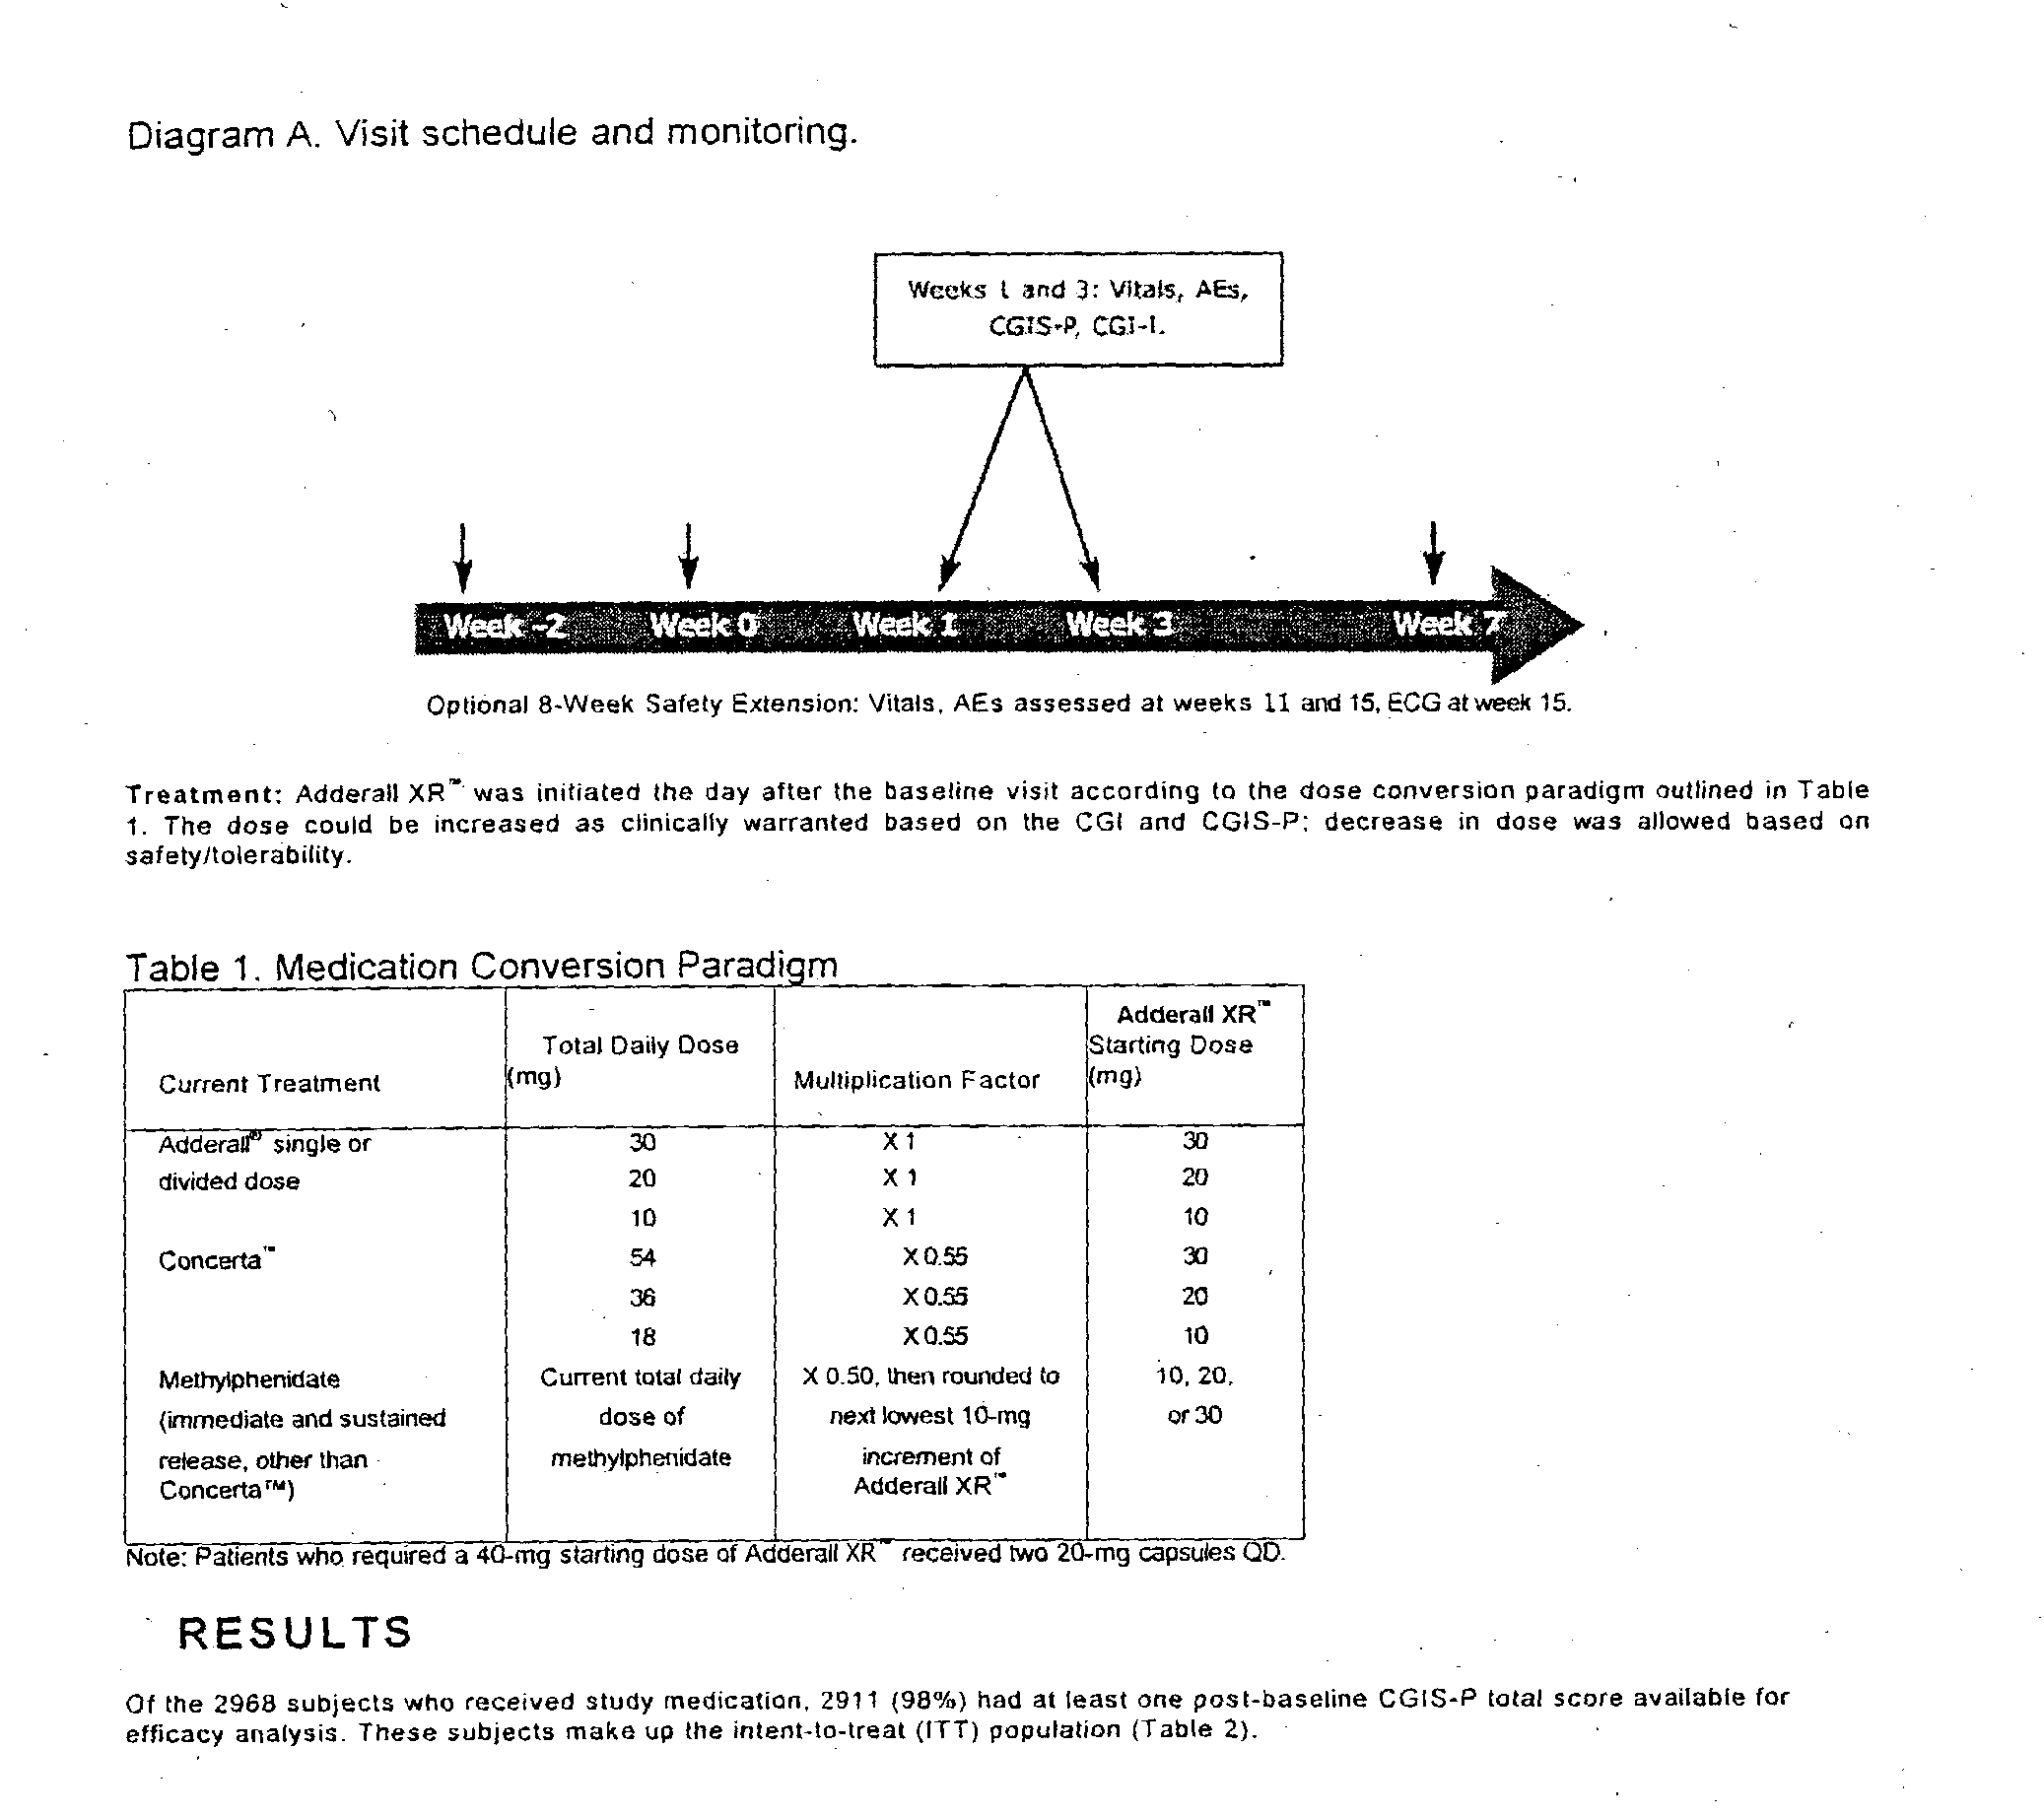 Dosage conversion for adhd medications - nermairololi